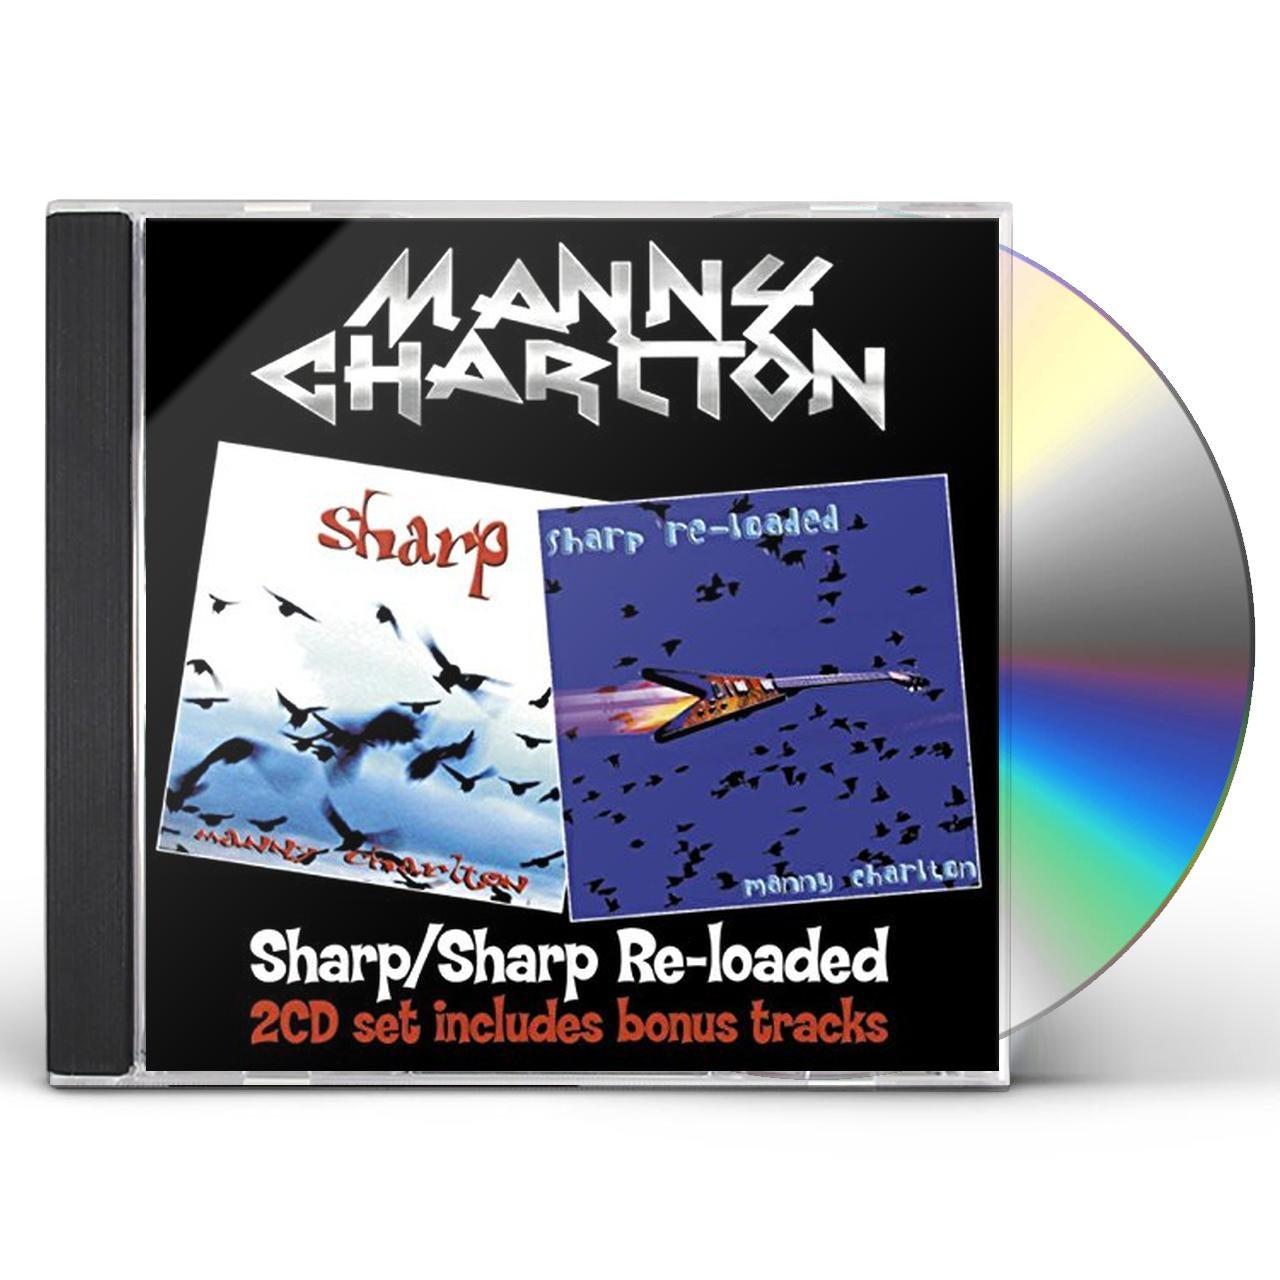 Manny Charlton SHARP/SHARP RE-LOADED CD